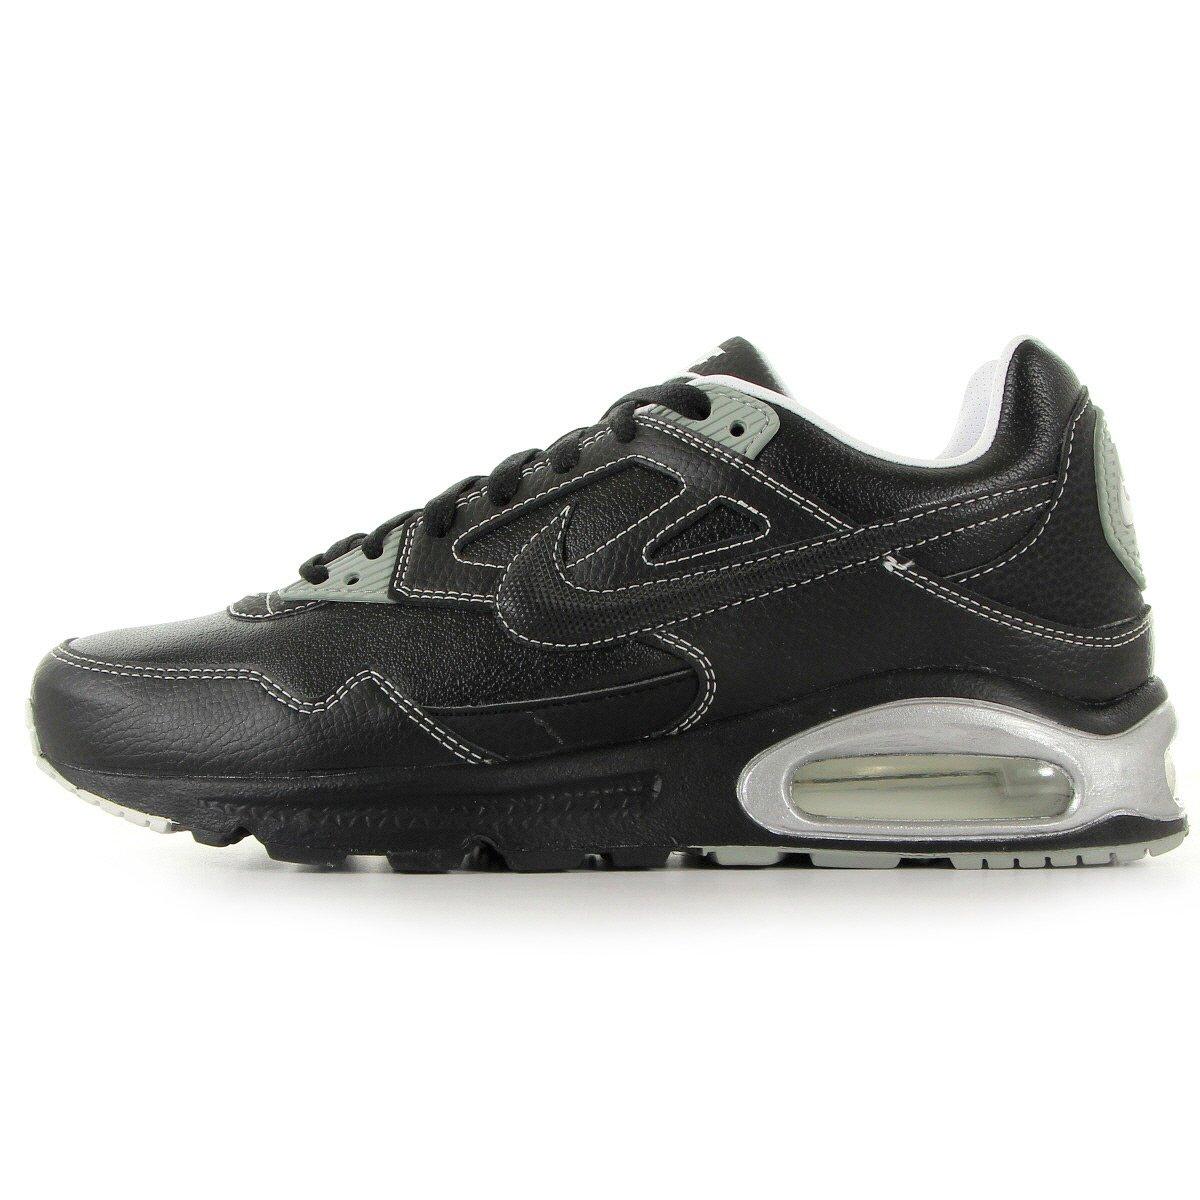 wholesale dealer fc6b2 ebd89 Nike Air Max Skyline Leather 409999 017 Mens Sneaker  Casual shoes Black 9  UK Amazon.co.uk Shoes  Bags